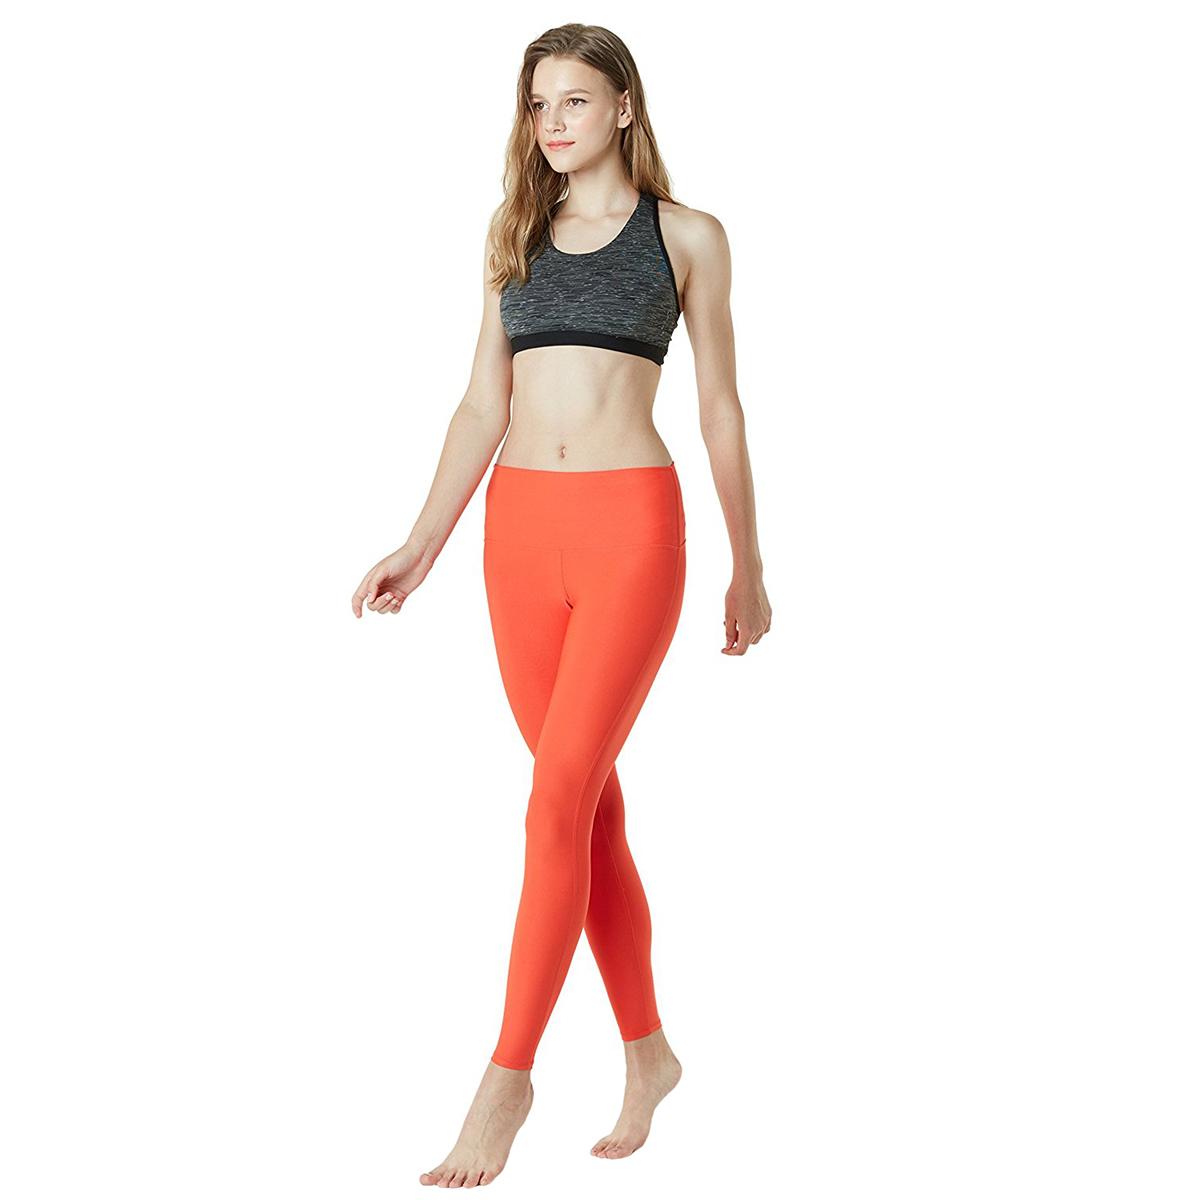 thumbnail 61 - TSLA Tesla FYP42 Women's High-Waisted Ultra-Stretch Tummy Control Yoga Pants